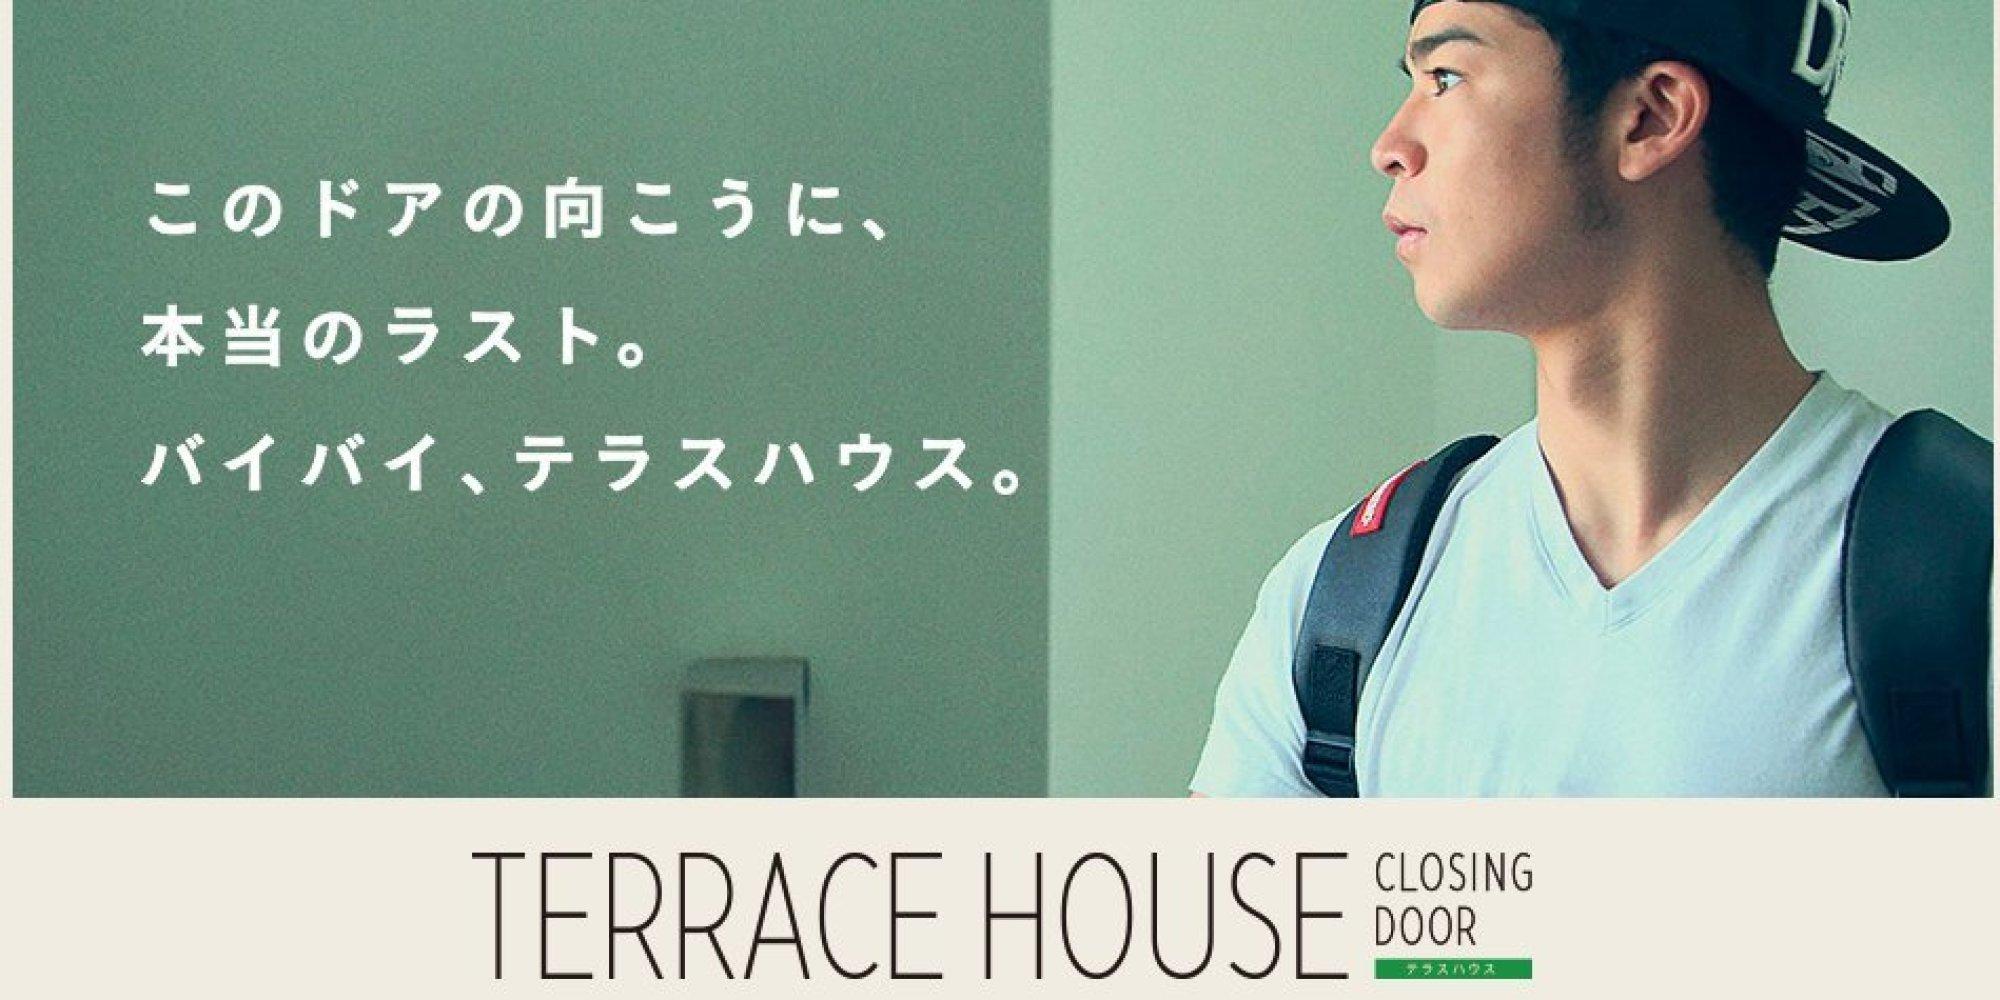 Netflix for Netflix terrace house